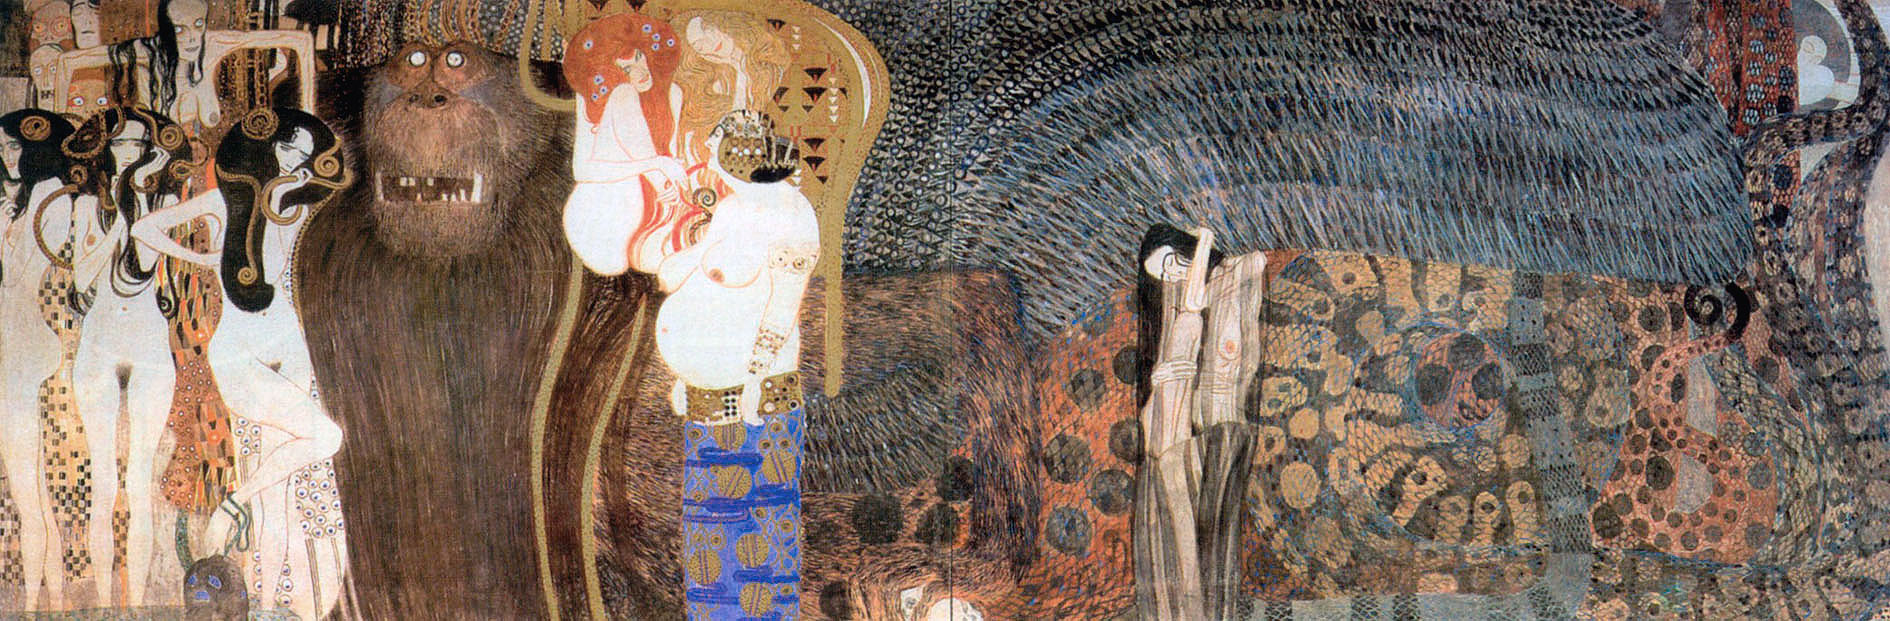 Fregio di Beethoven - Klimt